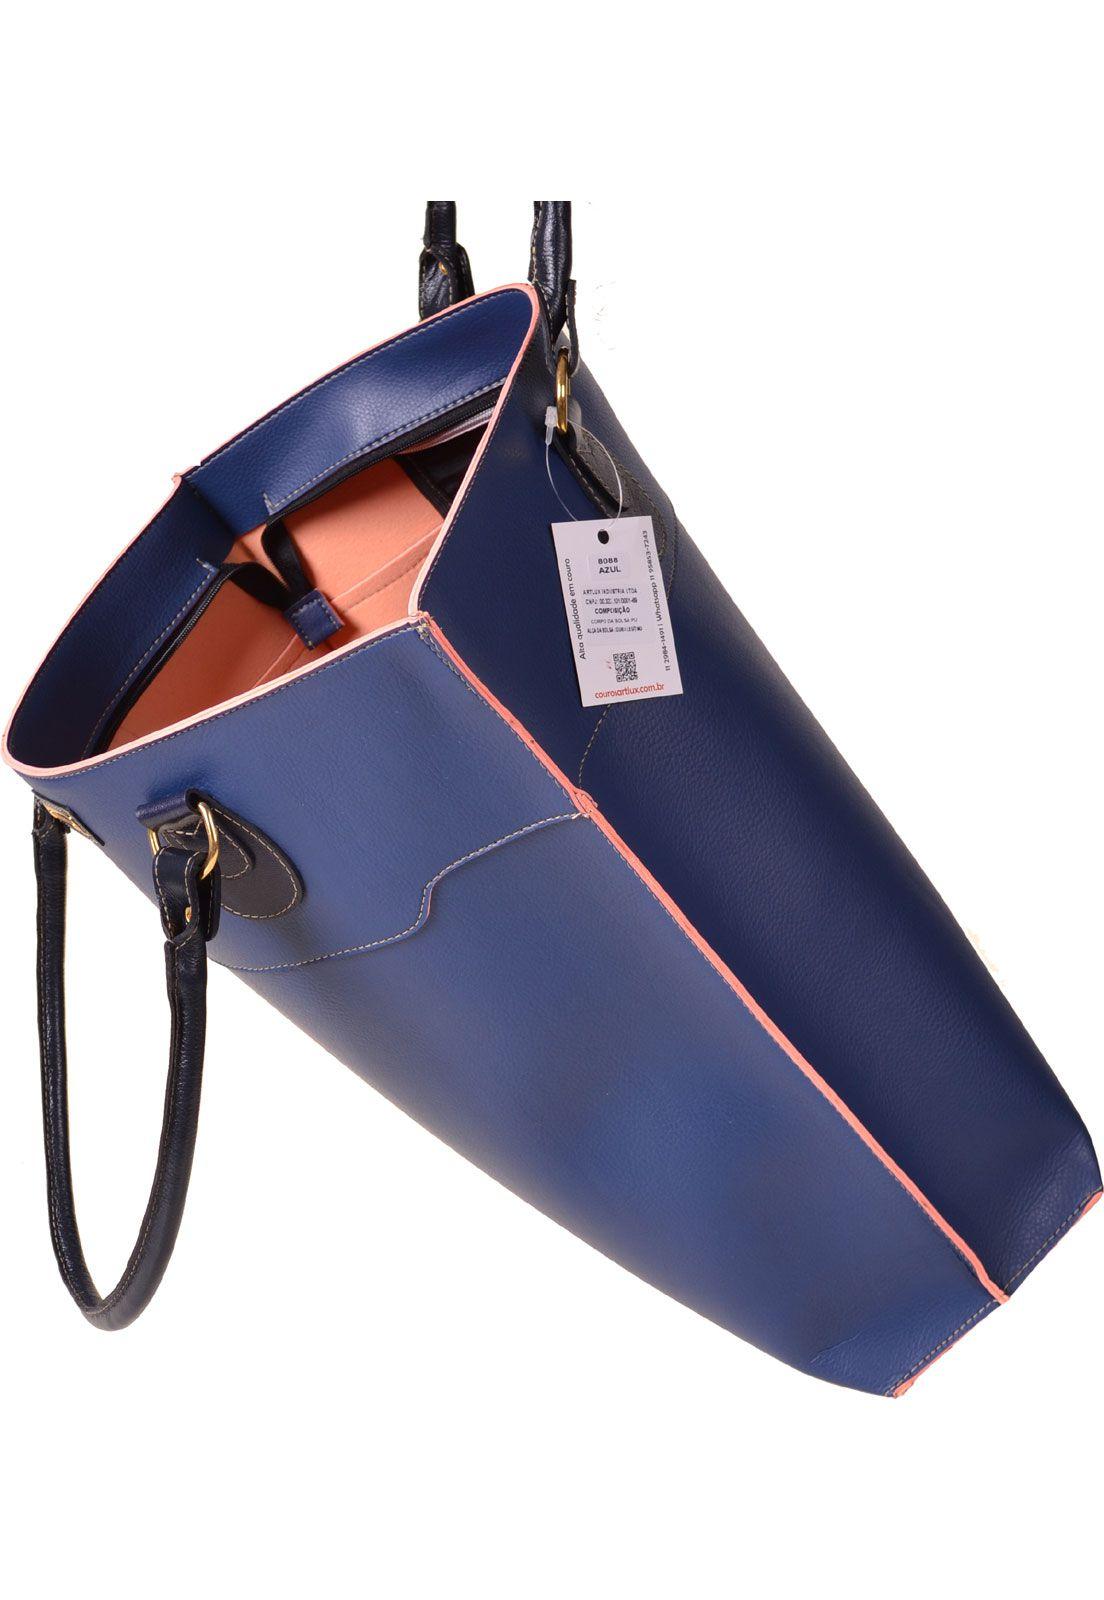 Bolsa Artlux Bicolor Azul